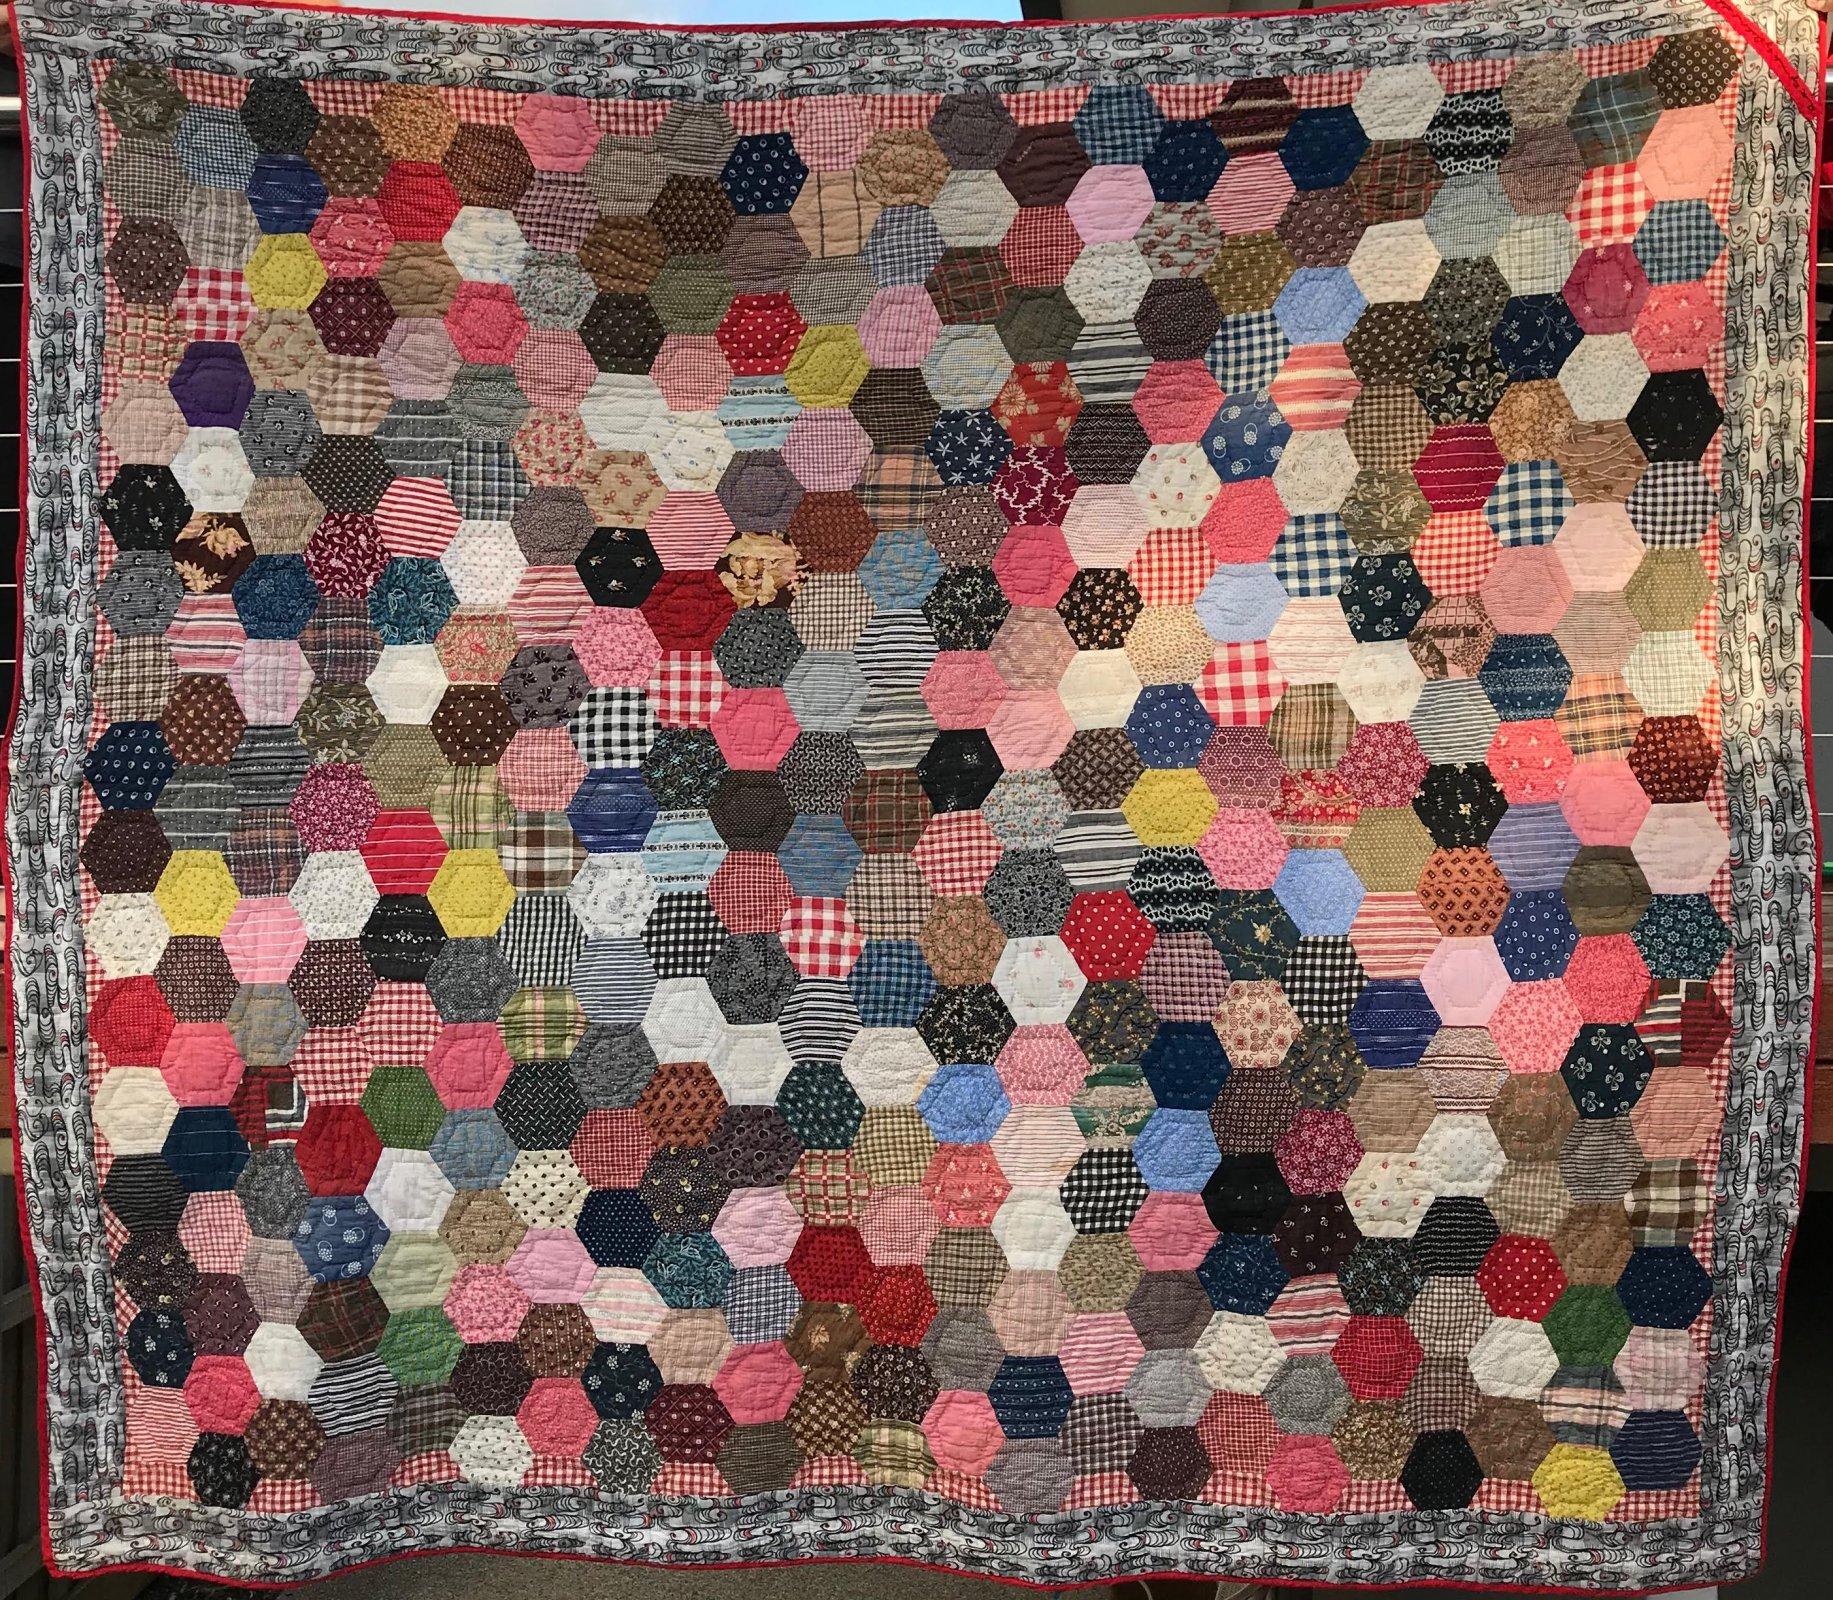 Late 1800s Hexagon Quilt